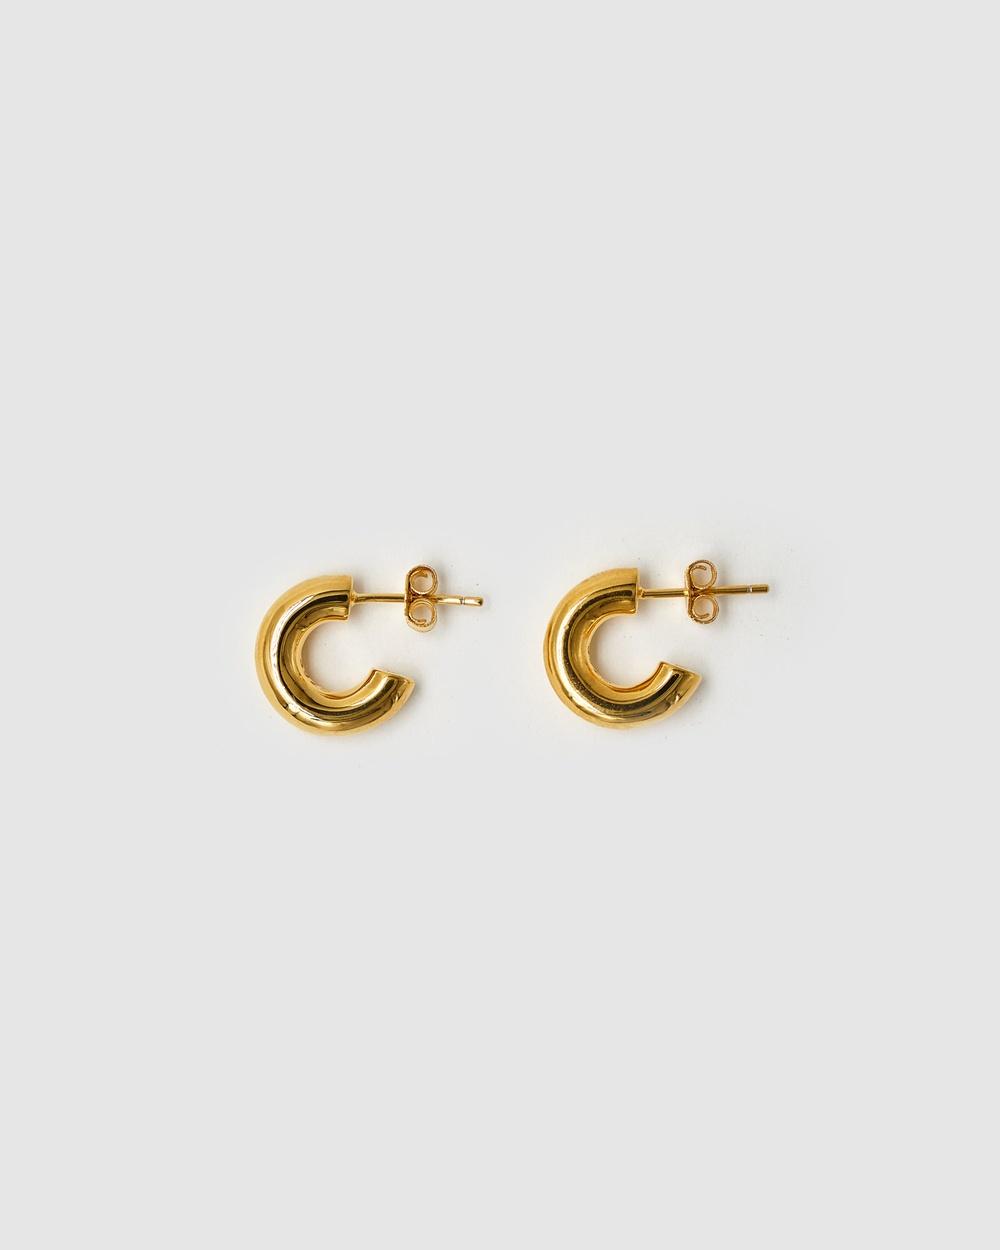 Brie Leon 925 Solid Everyday Mini Stud Earrings Jewellery Gold